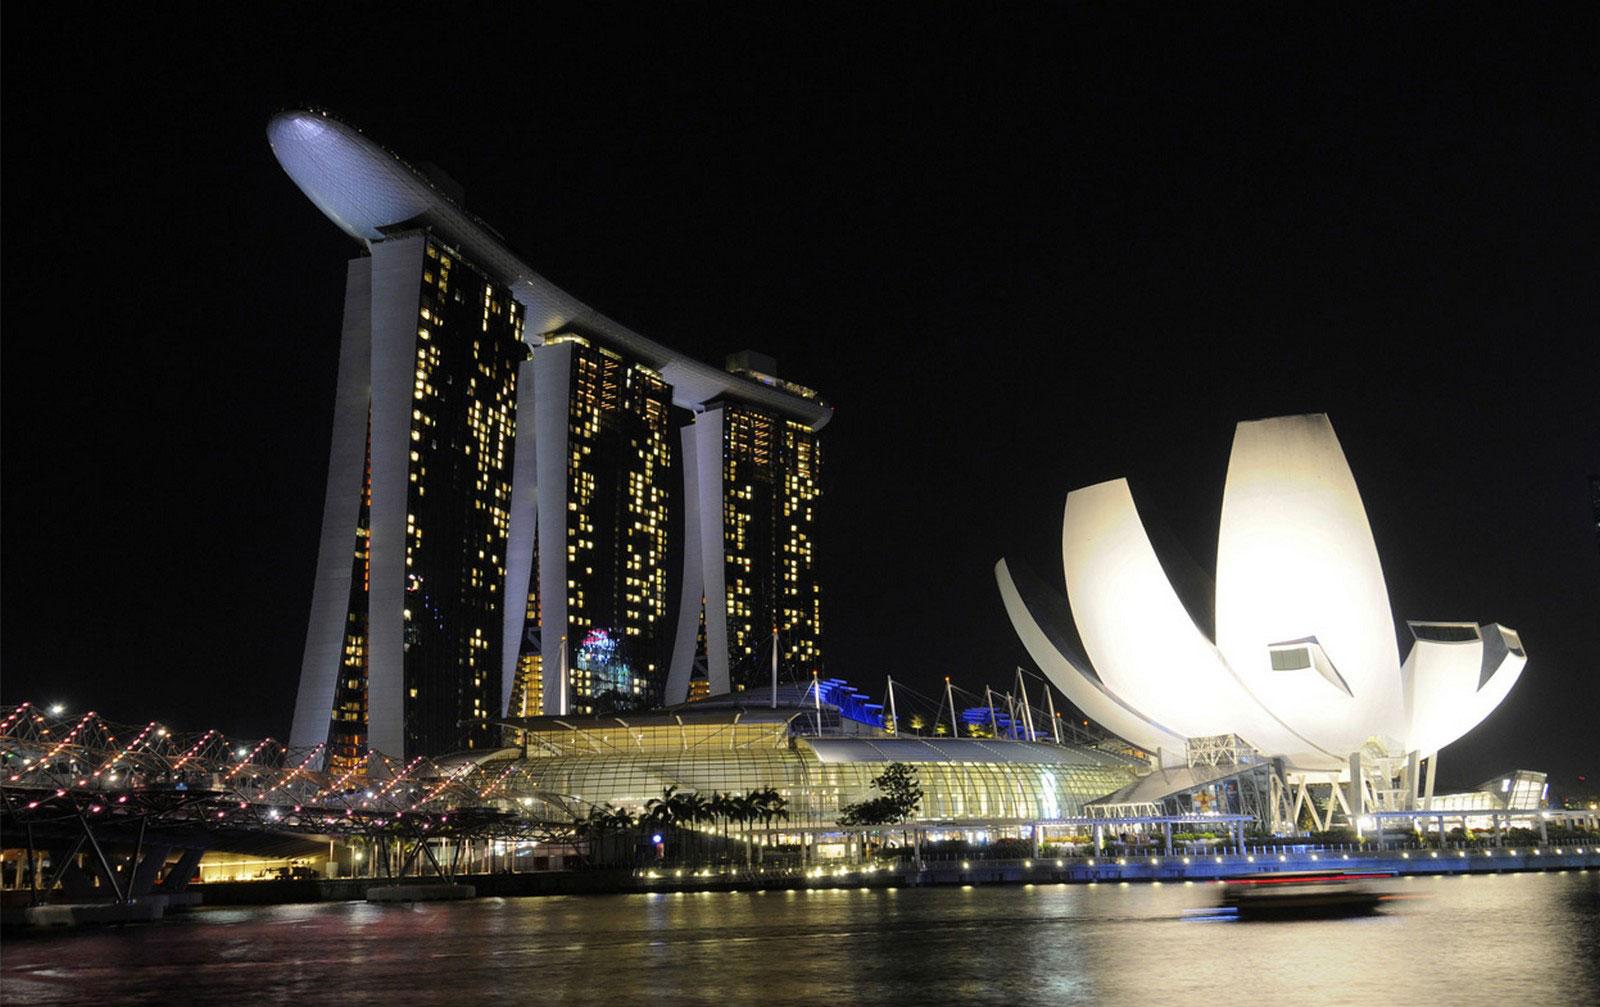 гостиница и музей в Сингапуре